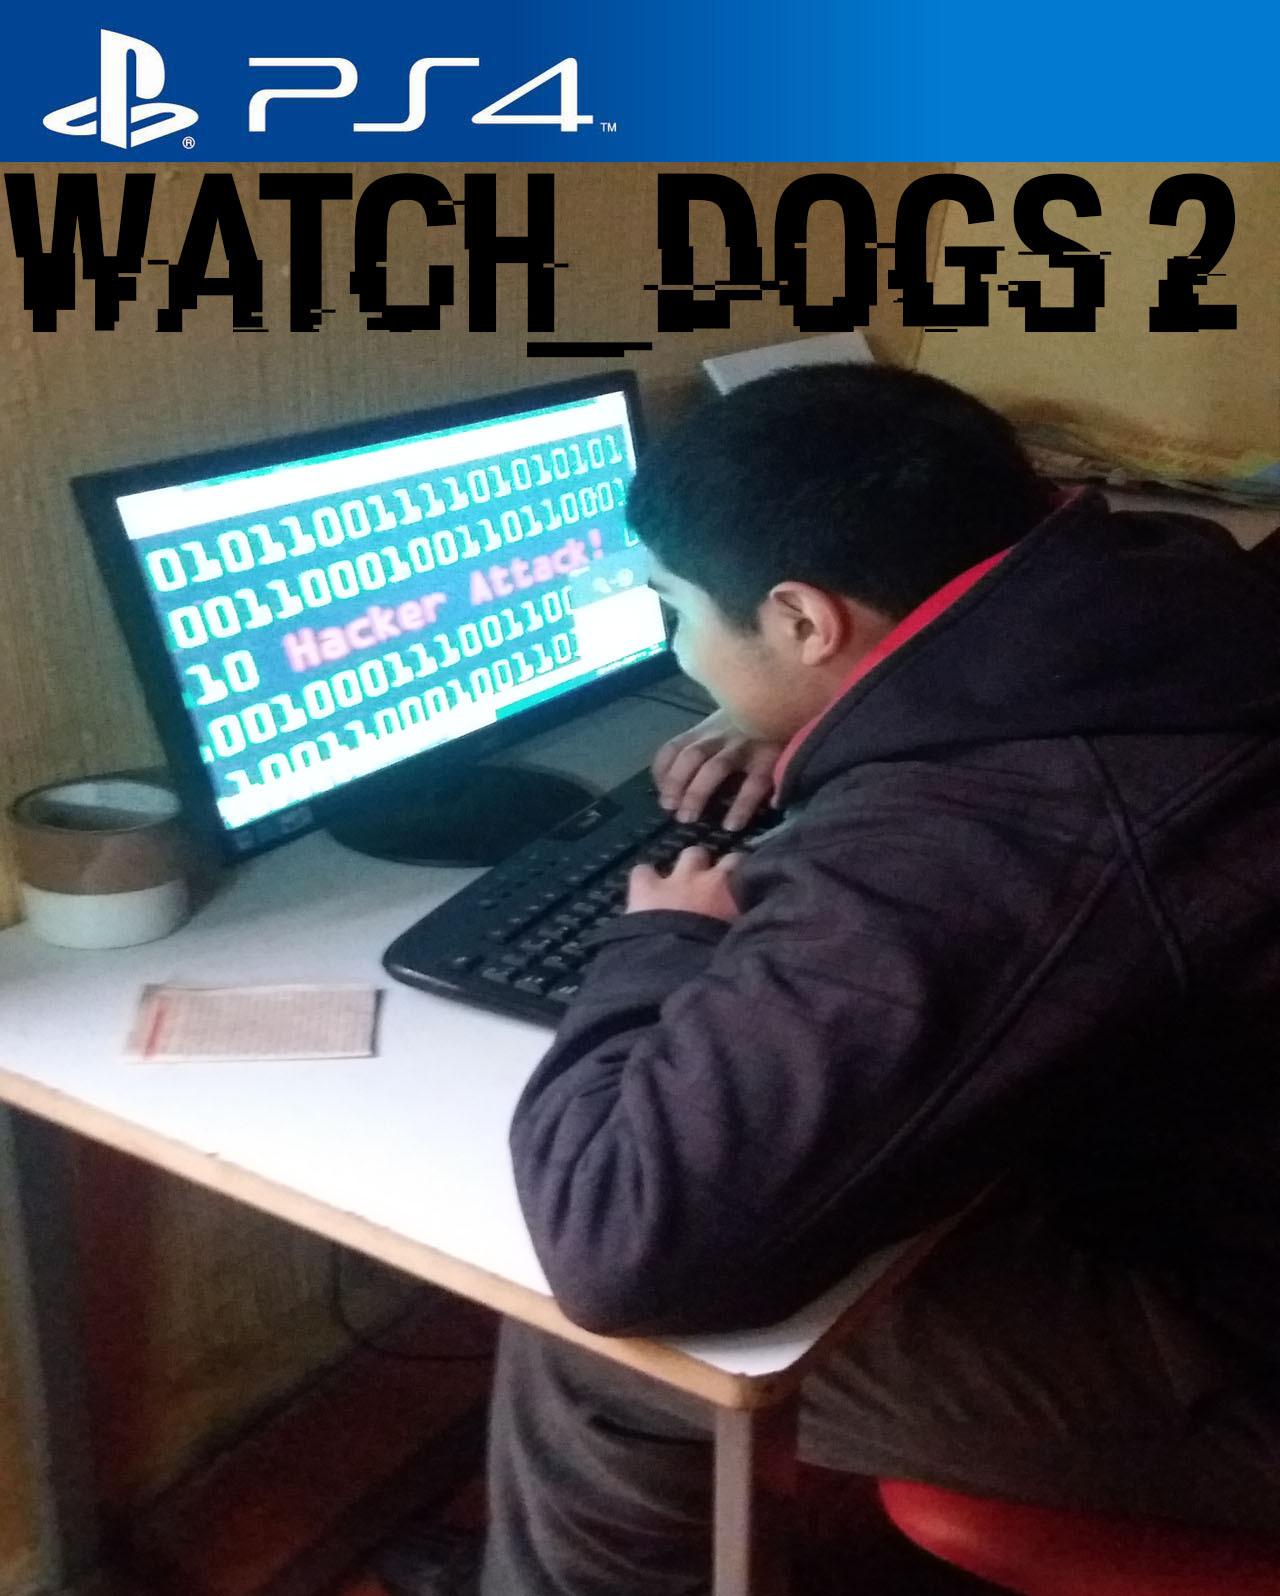 Watch dogs 2 version china? - meme